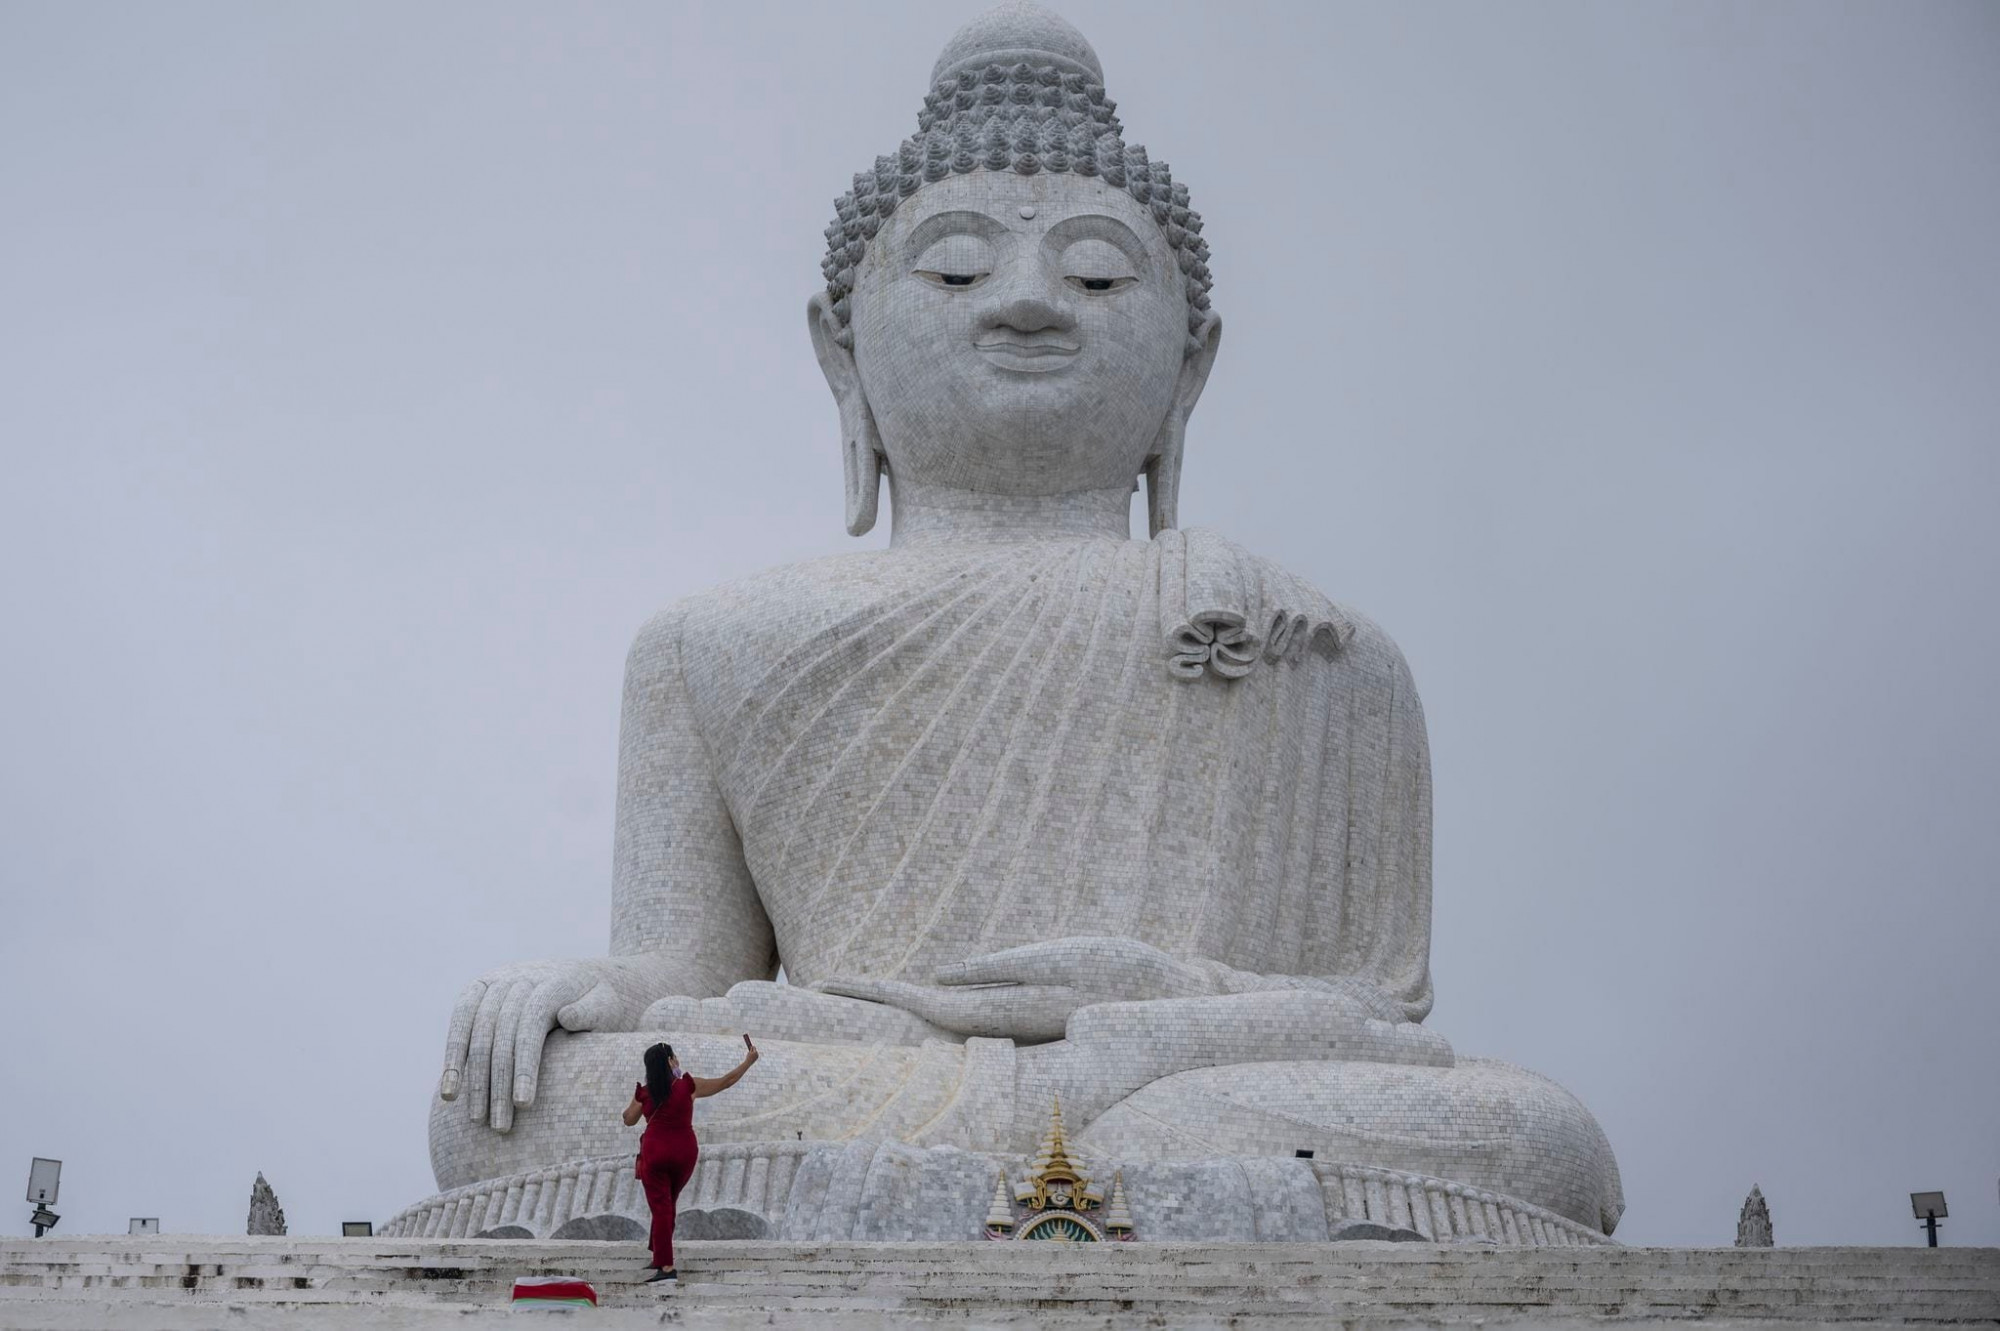 Du lịch châu Á đang rục rịch mở cửa trở lại - Ảnh: Sirachai Arunrugstichai/Getty Images